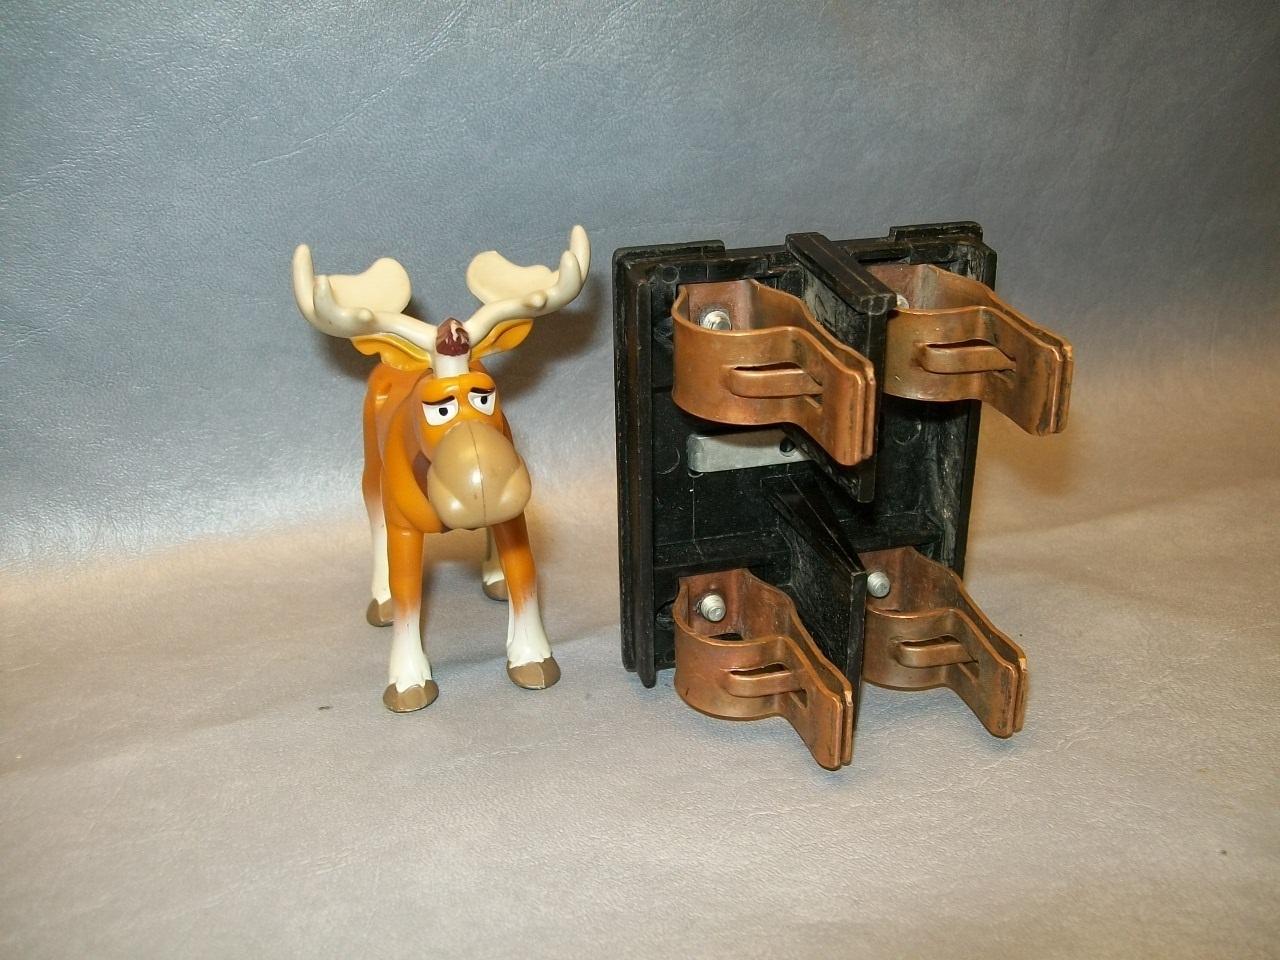 Federal Pacific Fuse Holder Circuit Diagram Symbols Box Pull Outs Noark 60 Amp Range Vintage And 50 Similar Items Rh Bonanza Com Problems